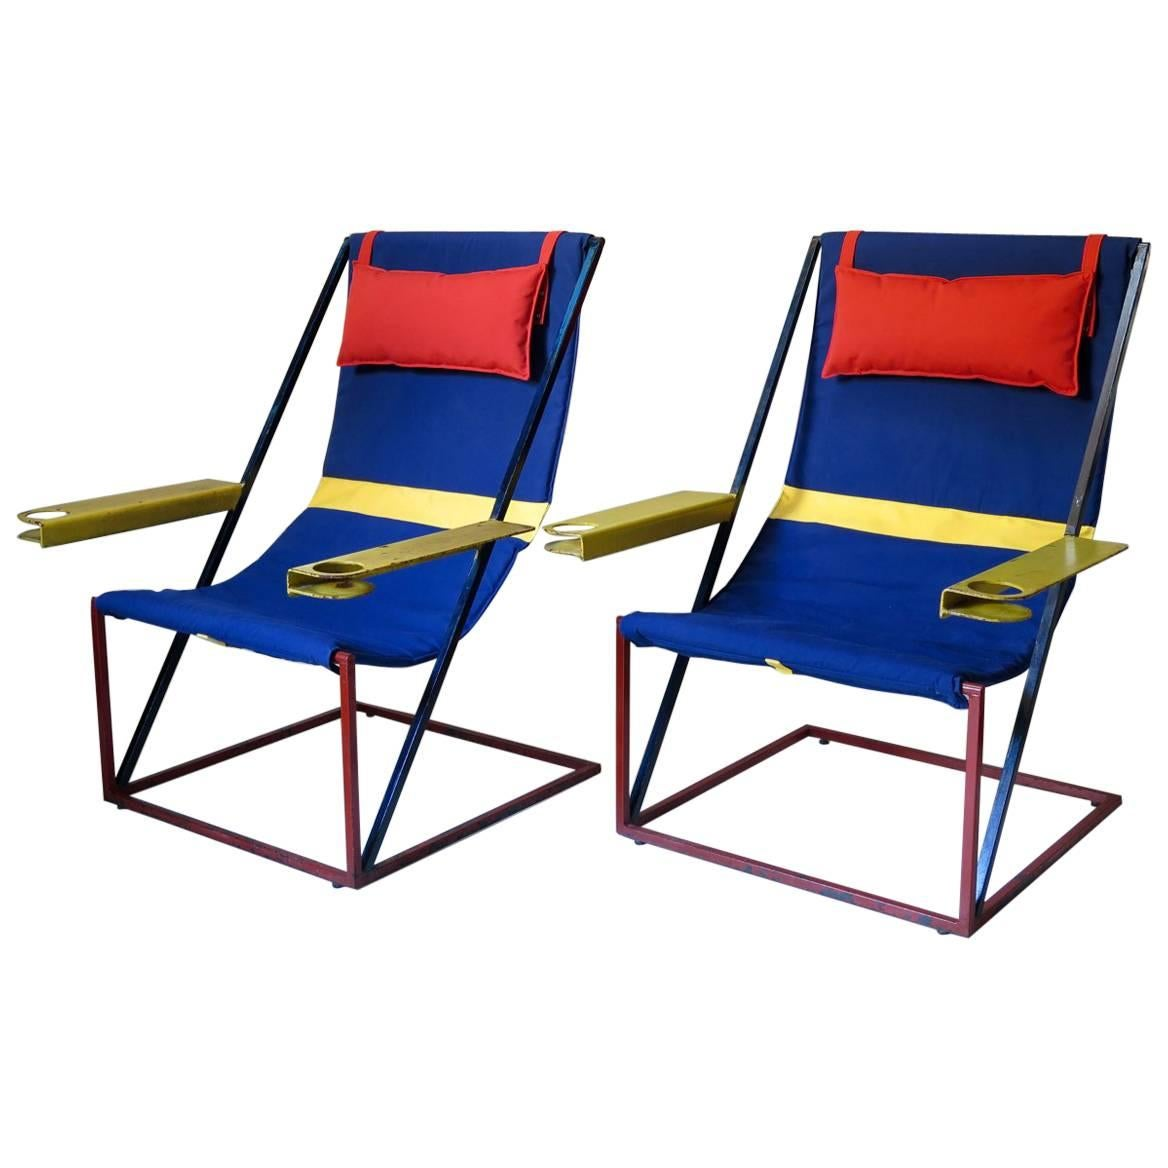 Jumbo Modernist Chairs, France, circa 1950s